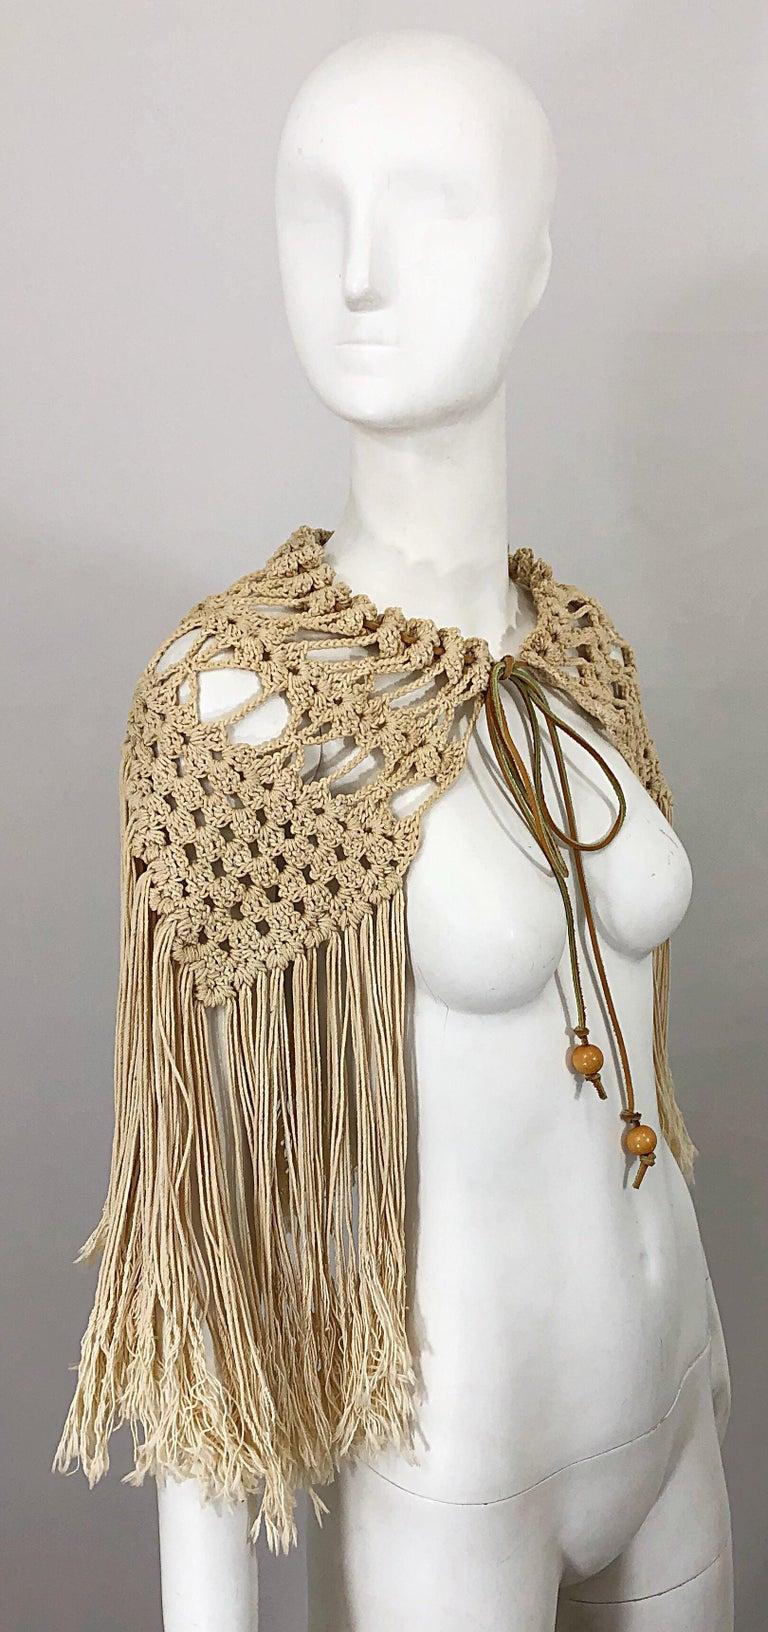 1970s Amazing Khaki Brown Boho Vintage 70s Crochet Fringe Belt Or Capelet Cape For Sale 2